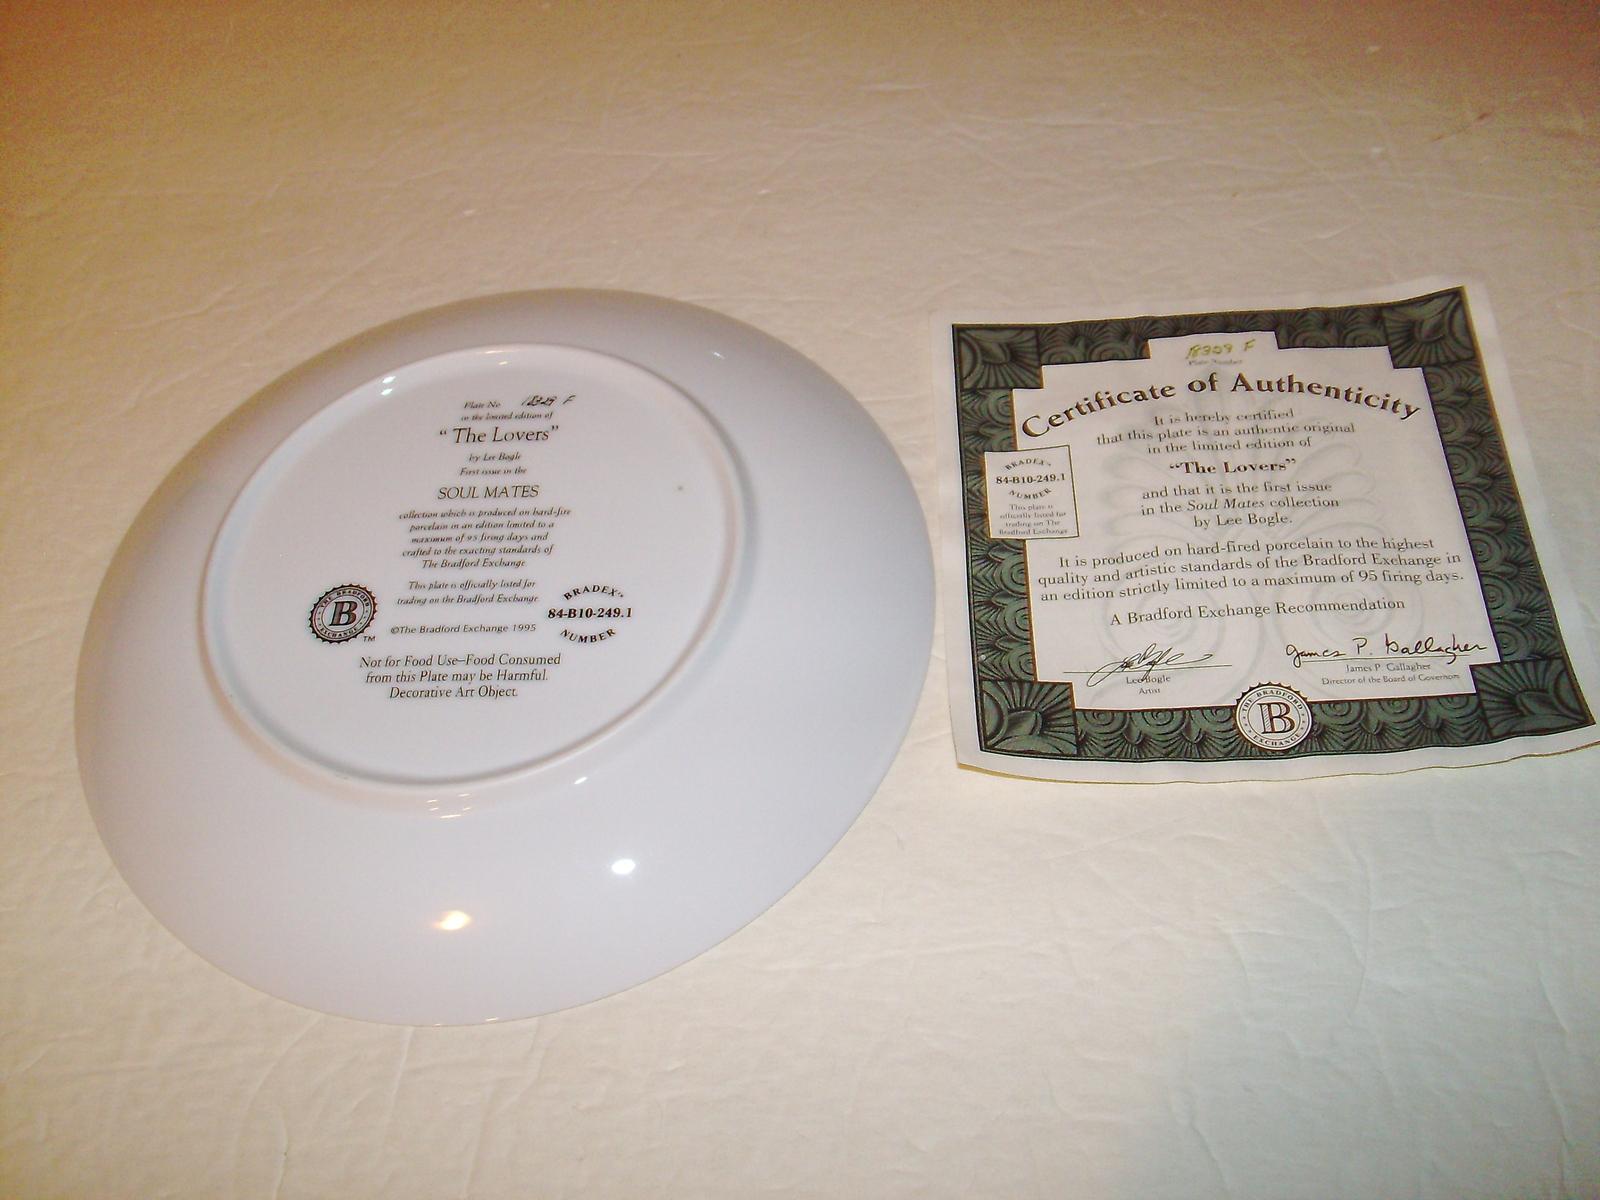 Bradford Exchange Collector Plate: The Lovers -Lee Bogle- 84-B10-249.1 + COA